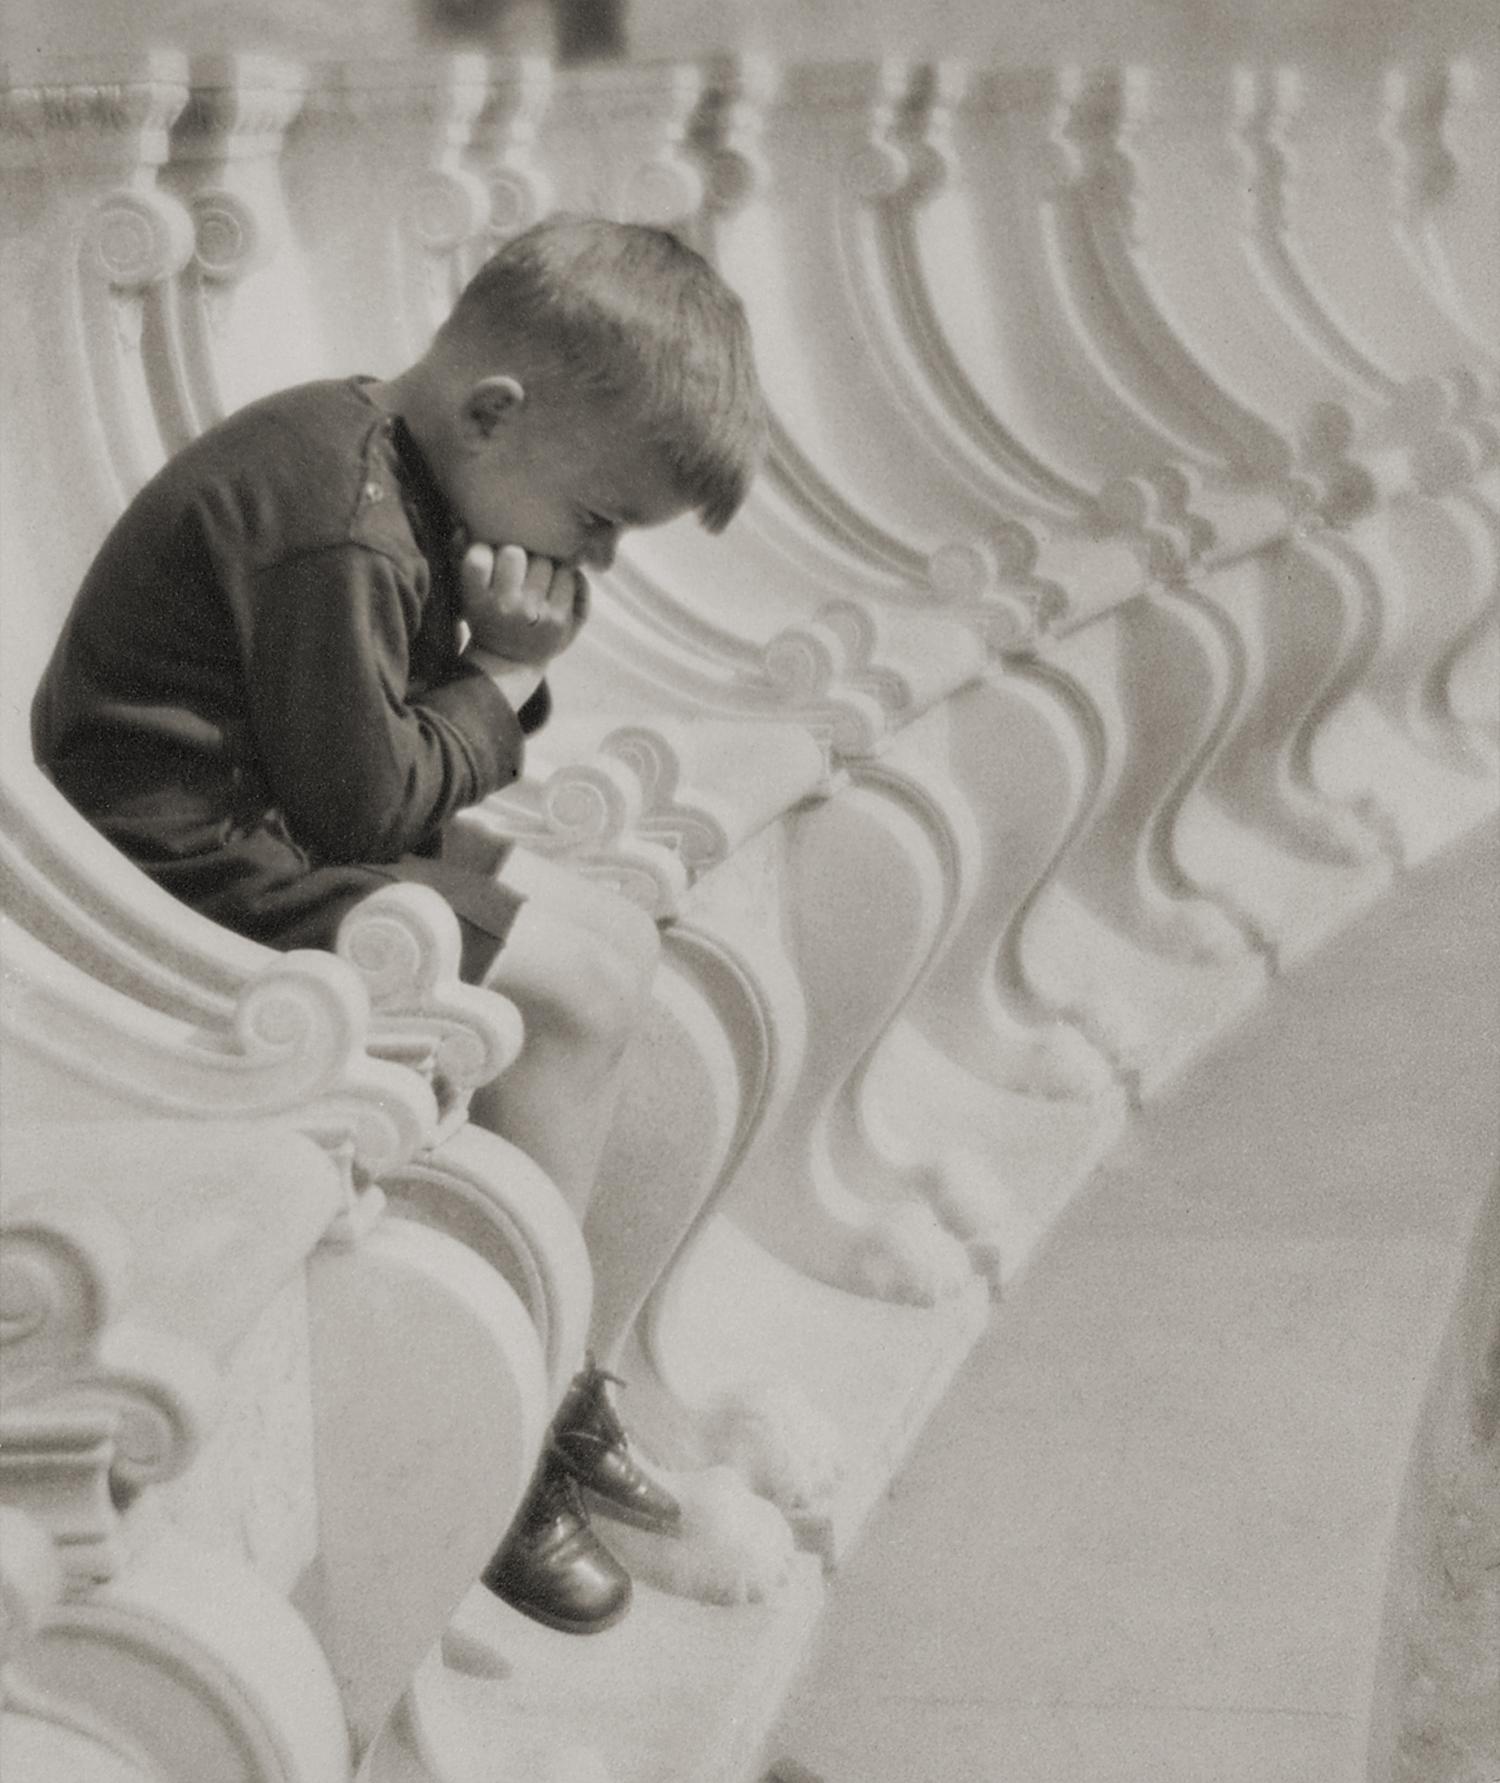 The Little Thinker